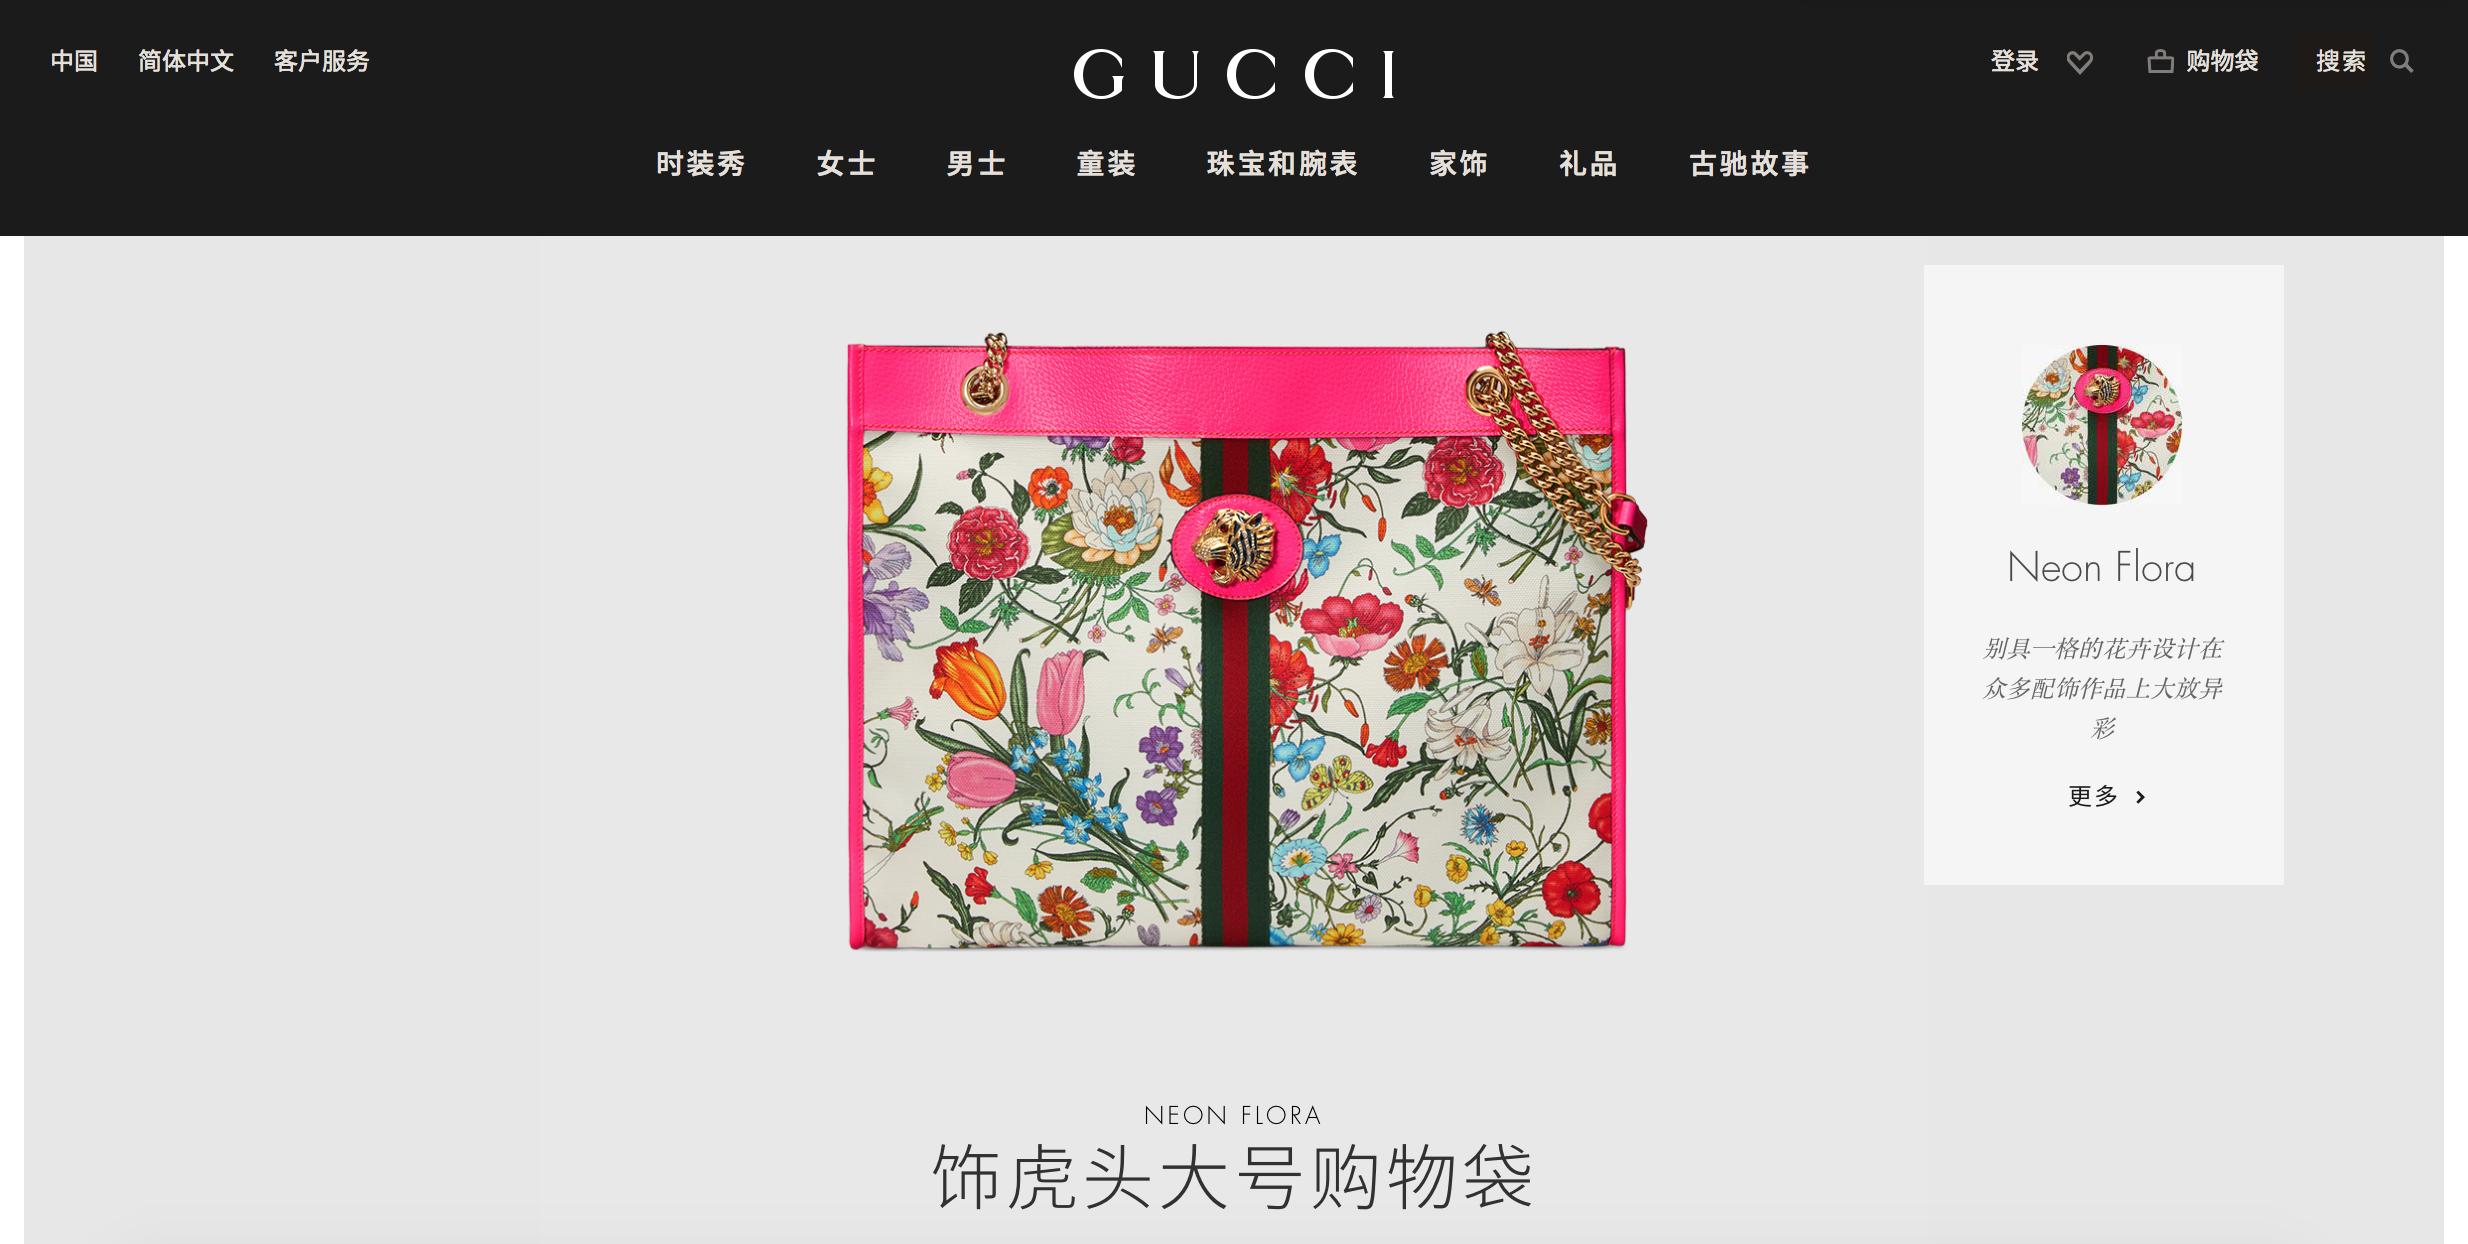 image: Gucci.cn